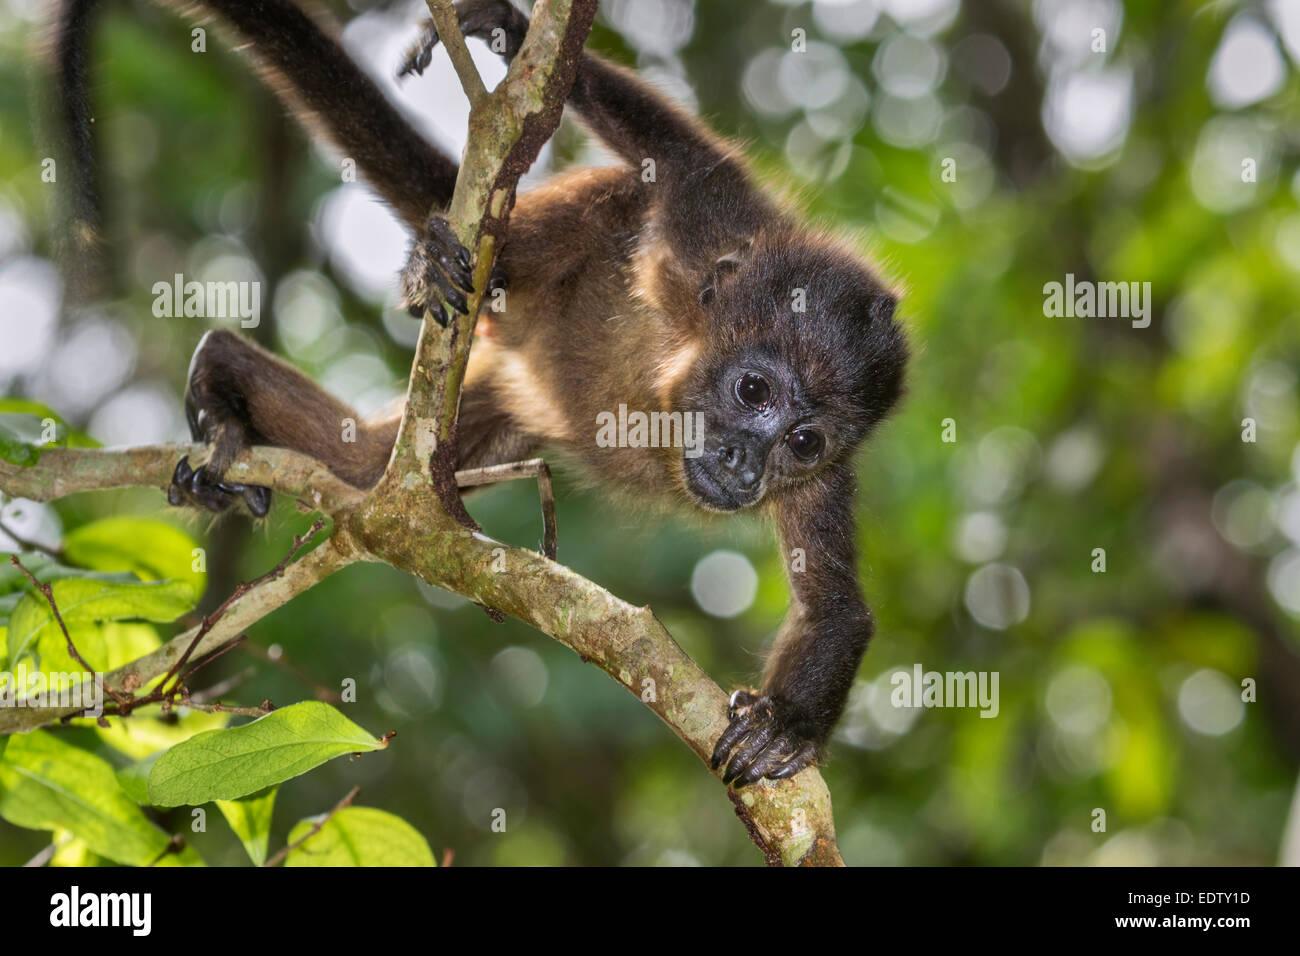 Baby-Jaguaren Brüllaffen (Alouatta Palliata) klettern Ast im Regenwald canopy, Cahuita Nationalpark, Limon, Stockbild